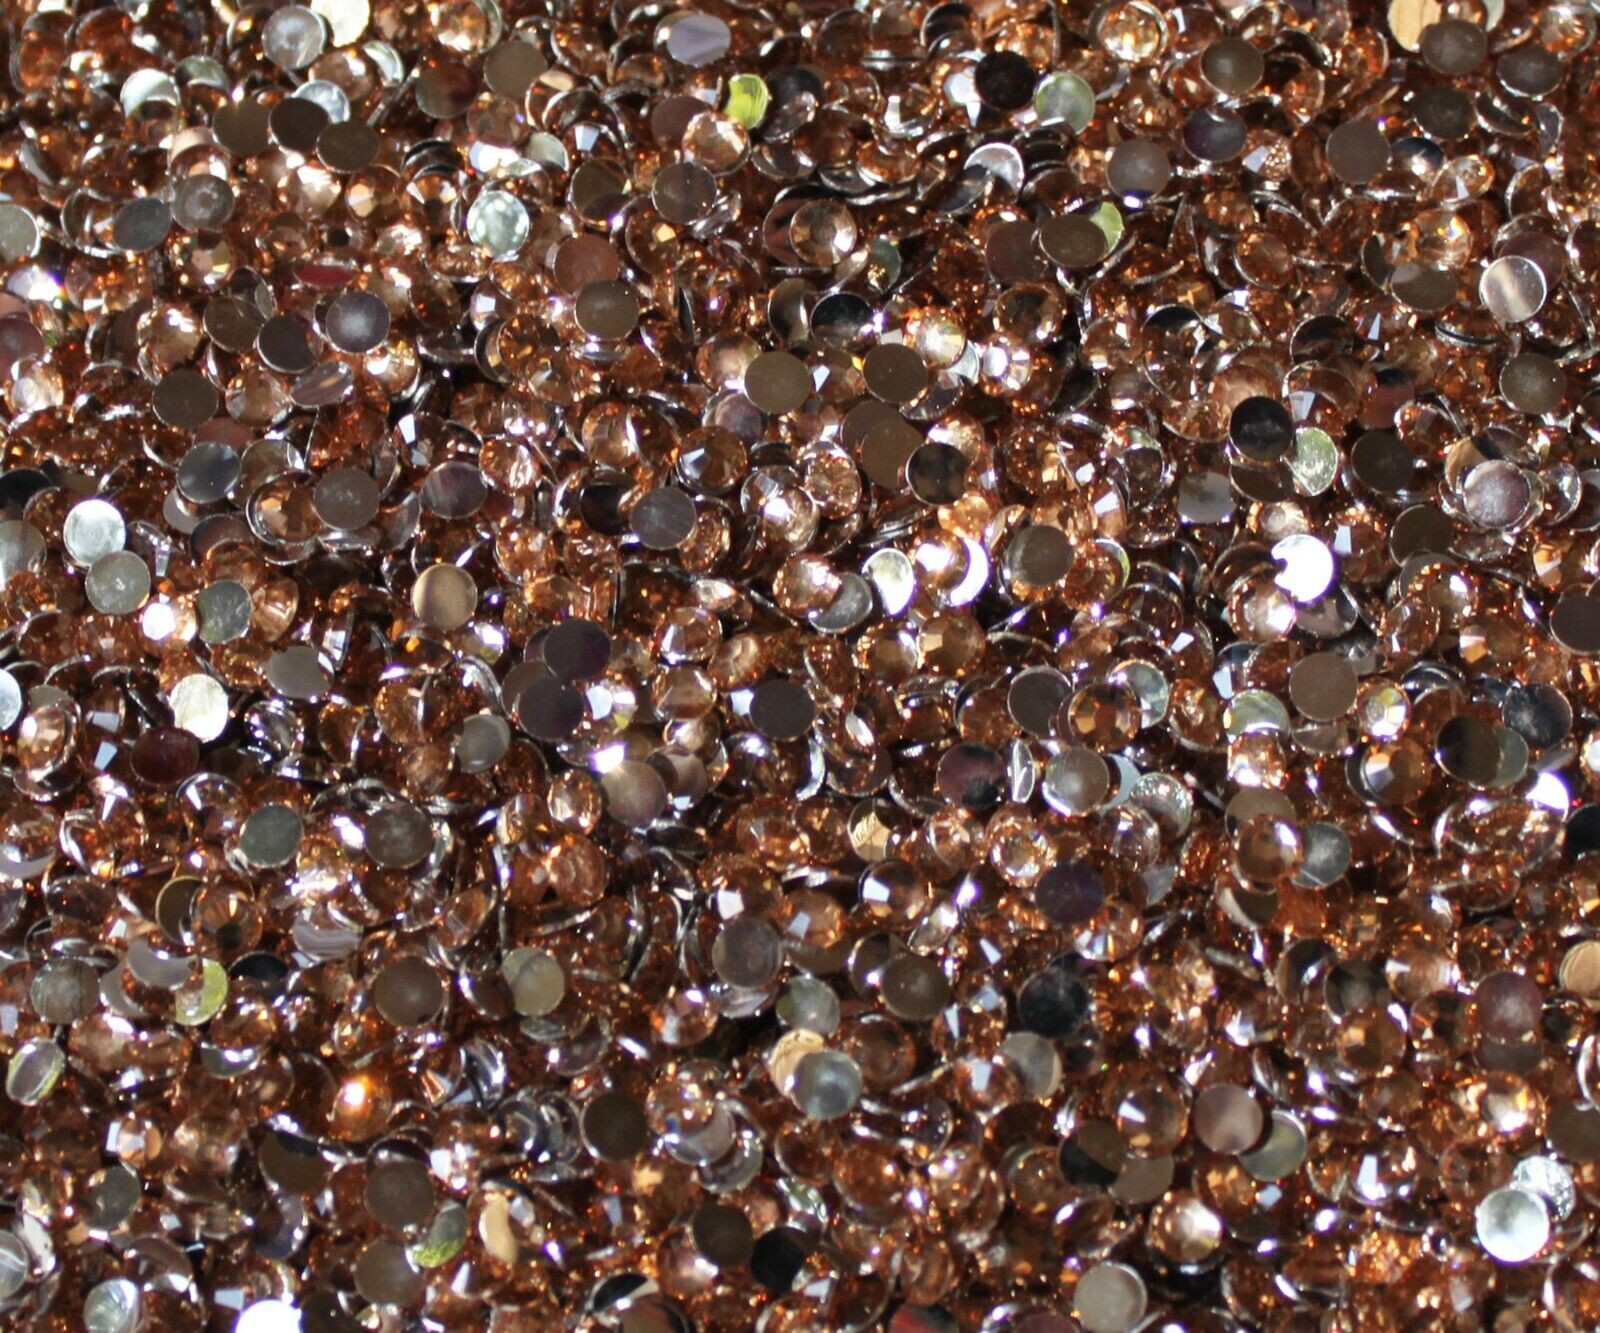 1000 Crystal Flat Back Resin Rhinestones Gems 60 colors, 2mm, 3mm, 4mm, 5mm, 6.5 CHAMPAGNE